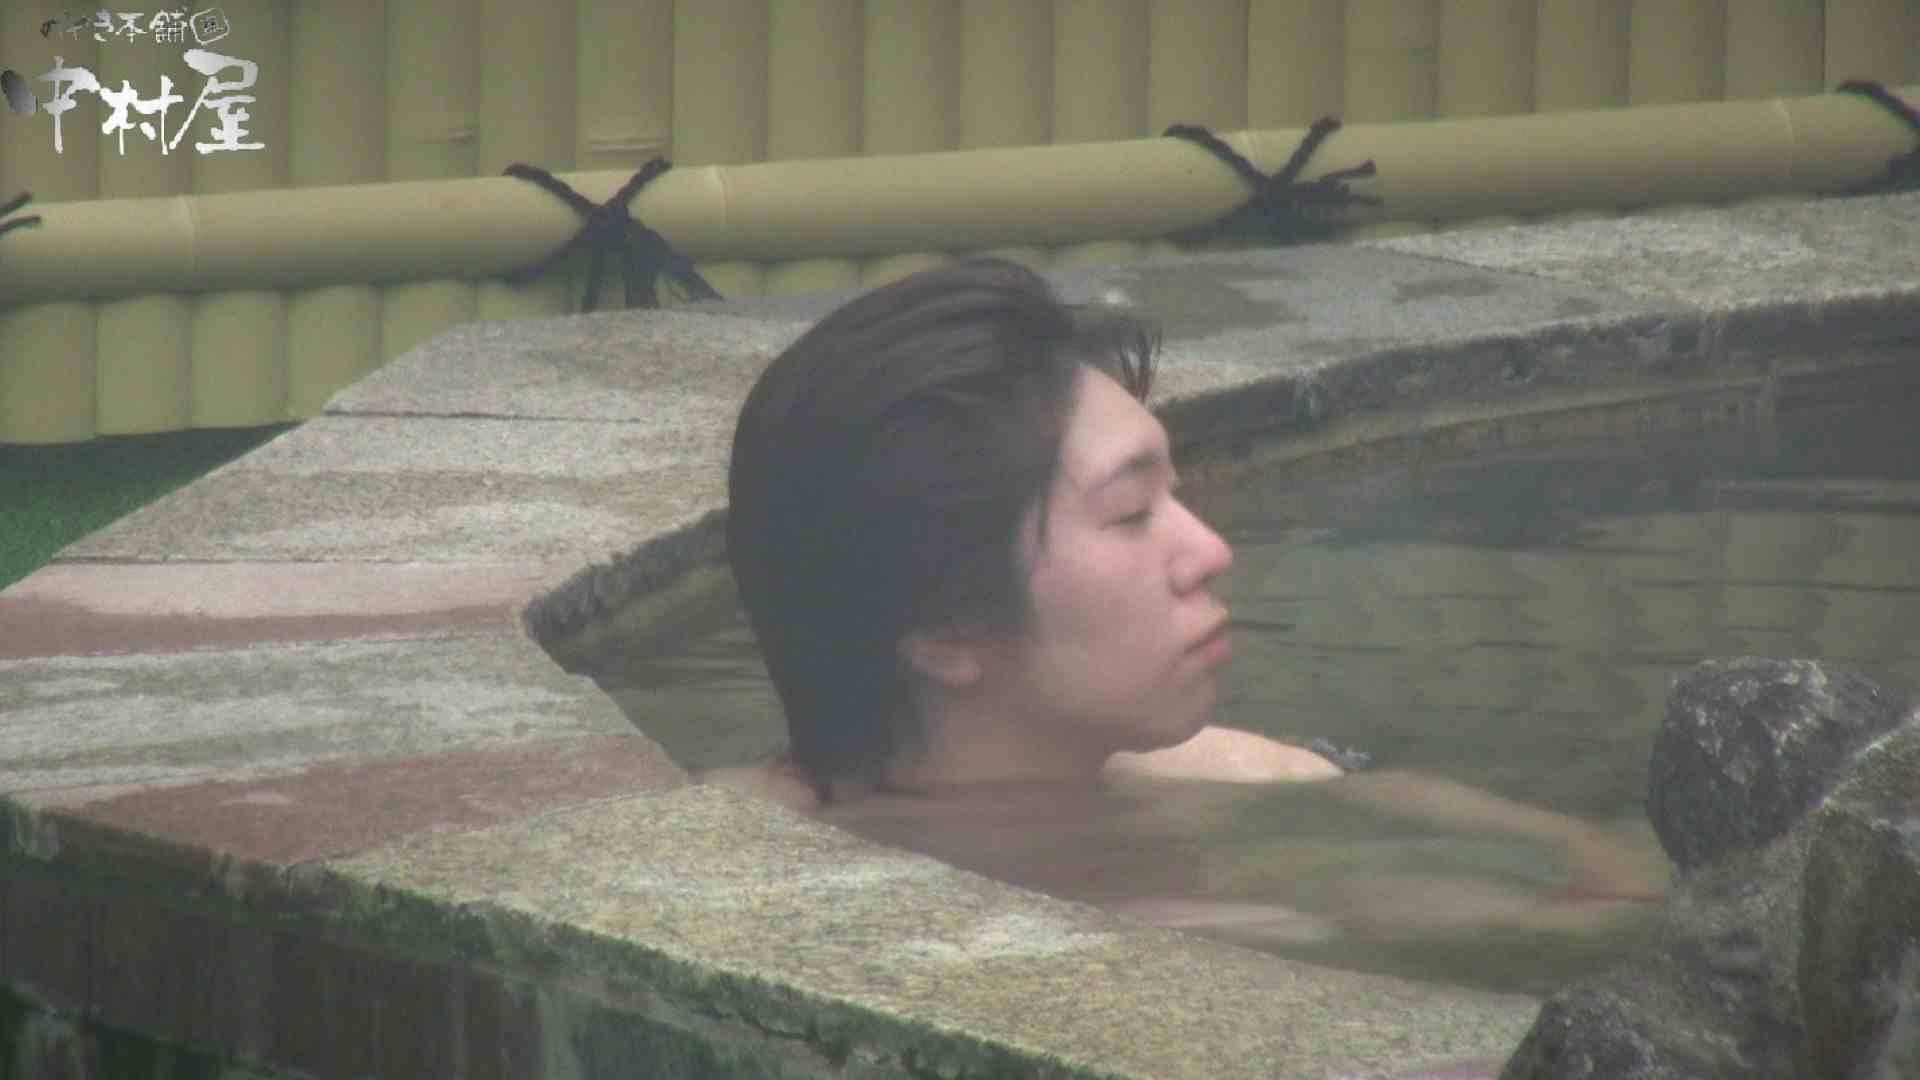 Aquaな露天風呂Vol.907 盗撮  62連発 6